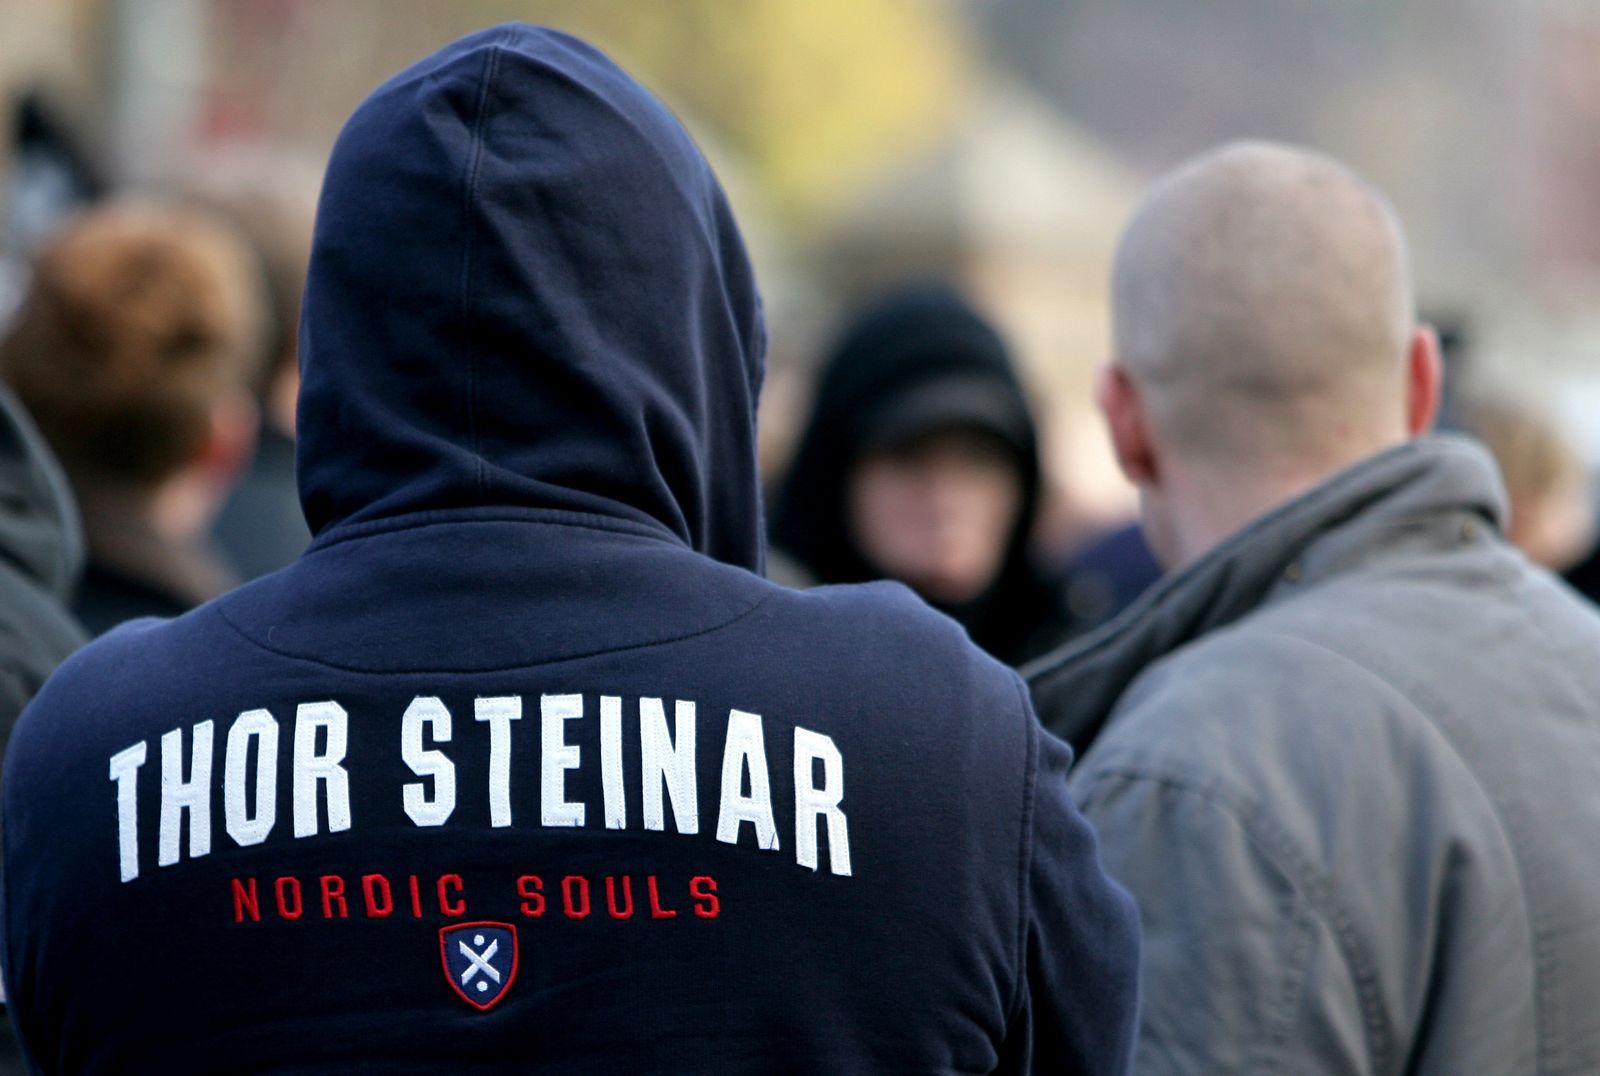 Thor Steinar/ Pullover